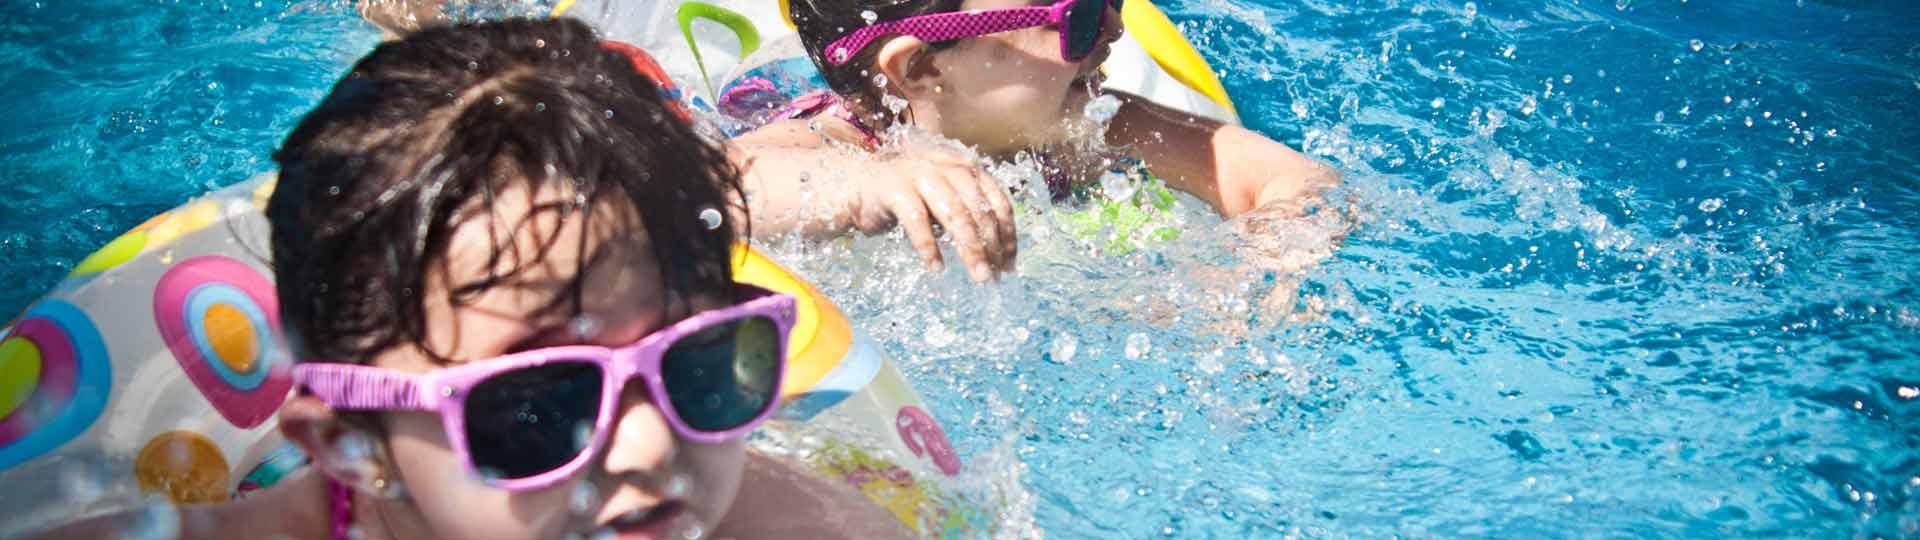 precauciones-bebes-piscina-detalle